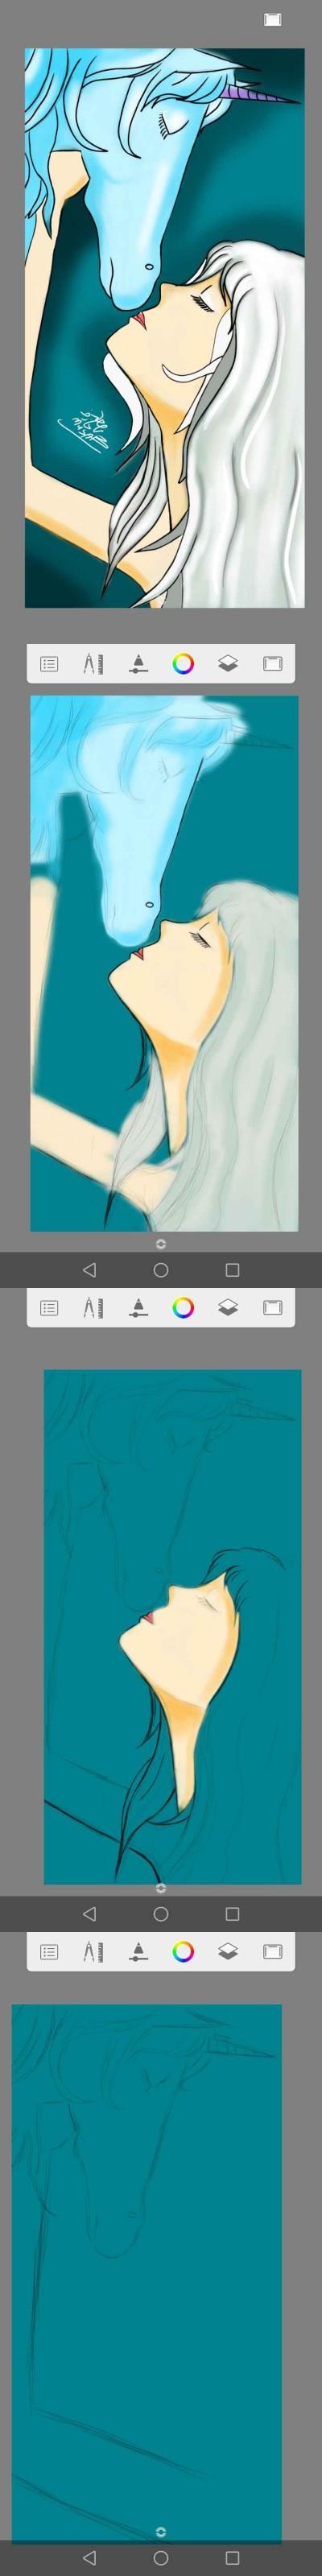 Art musab  | Art6musab | Digital Drawing | PENUP